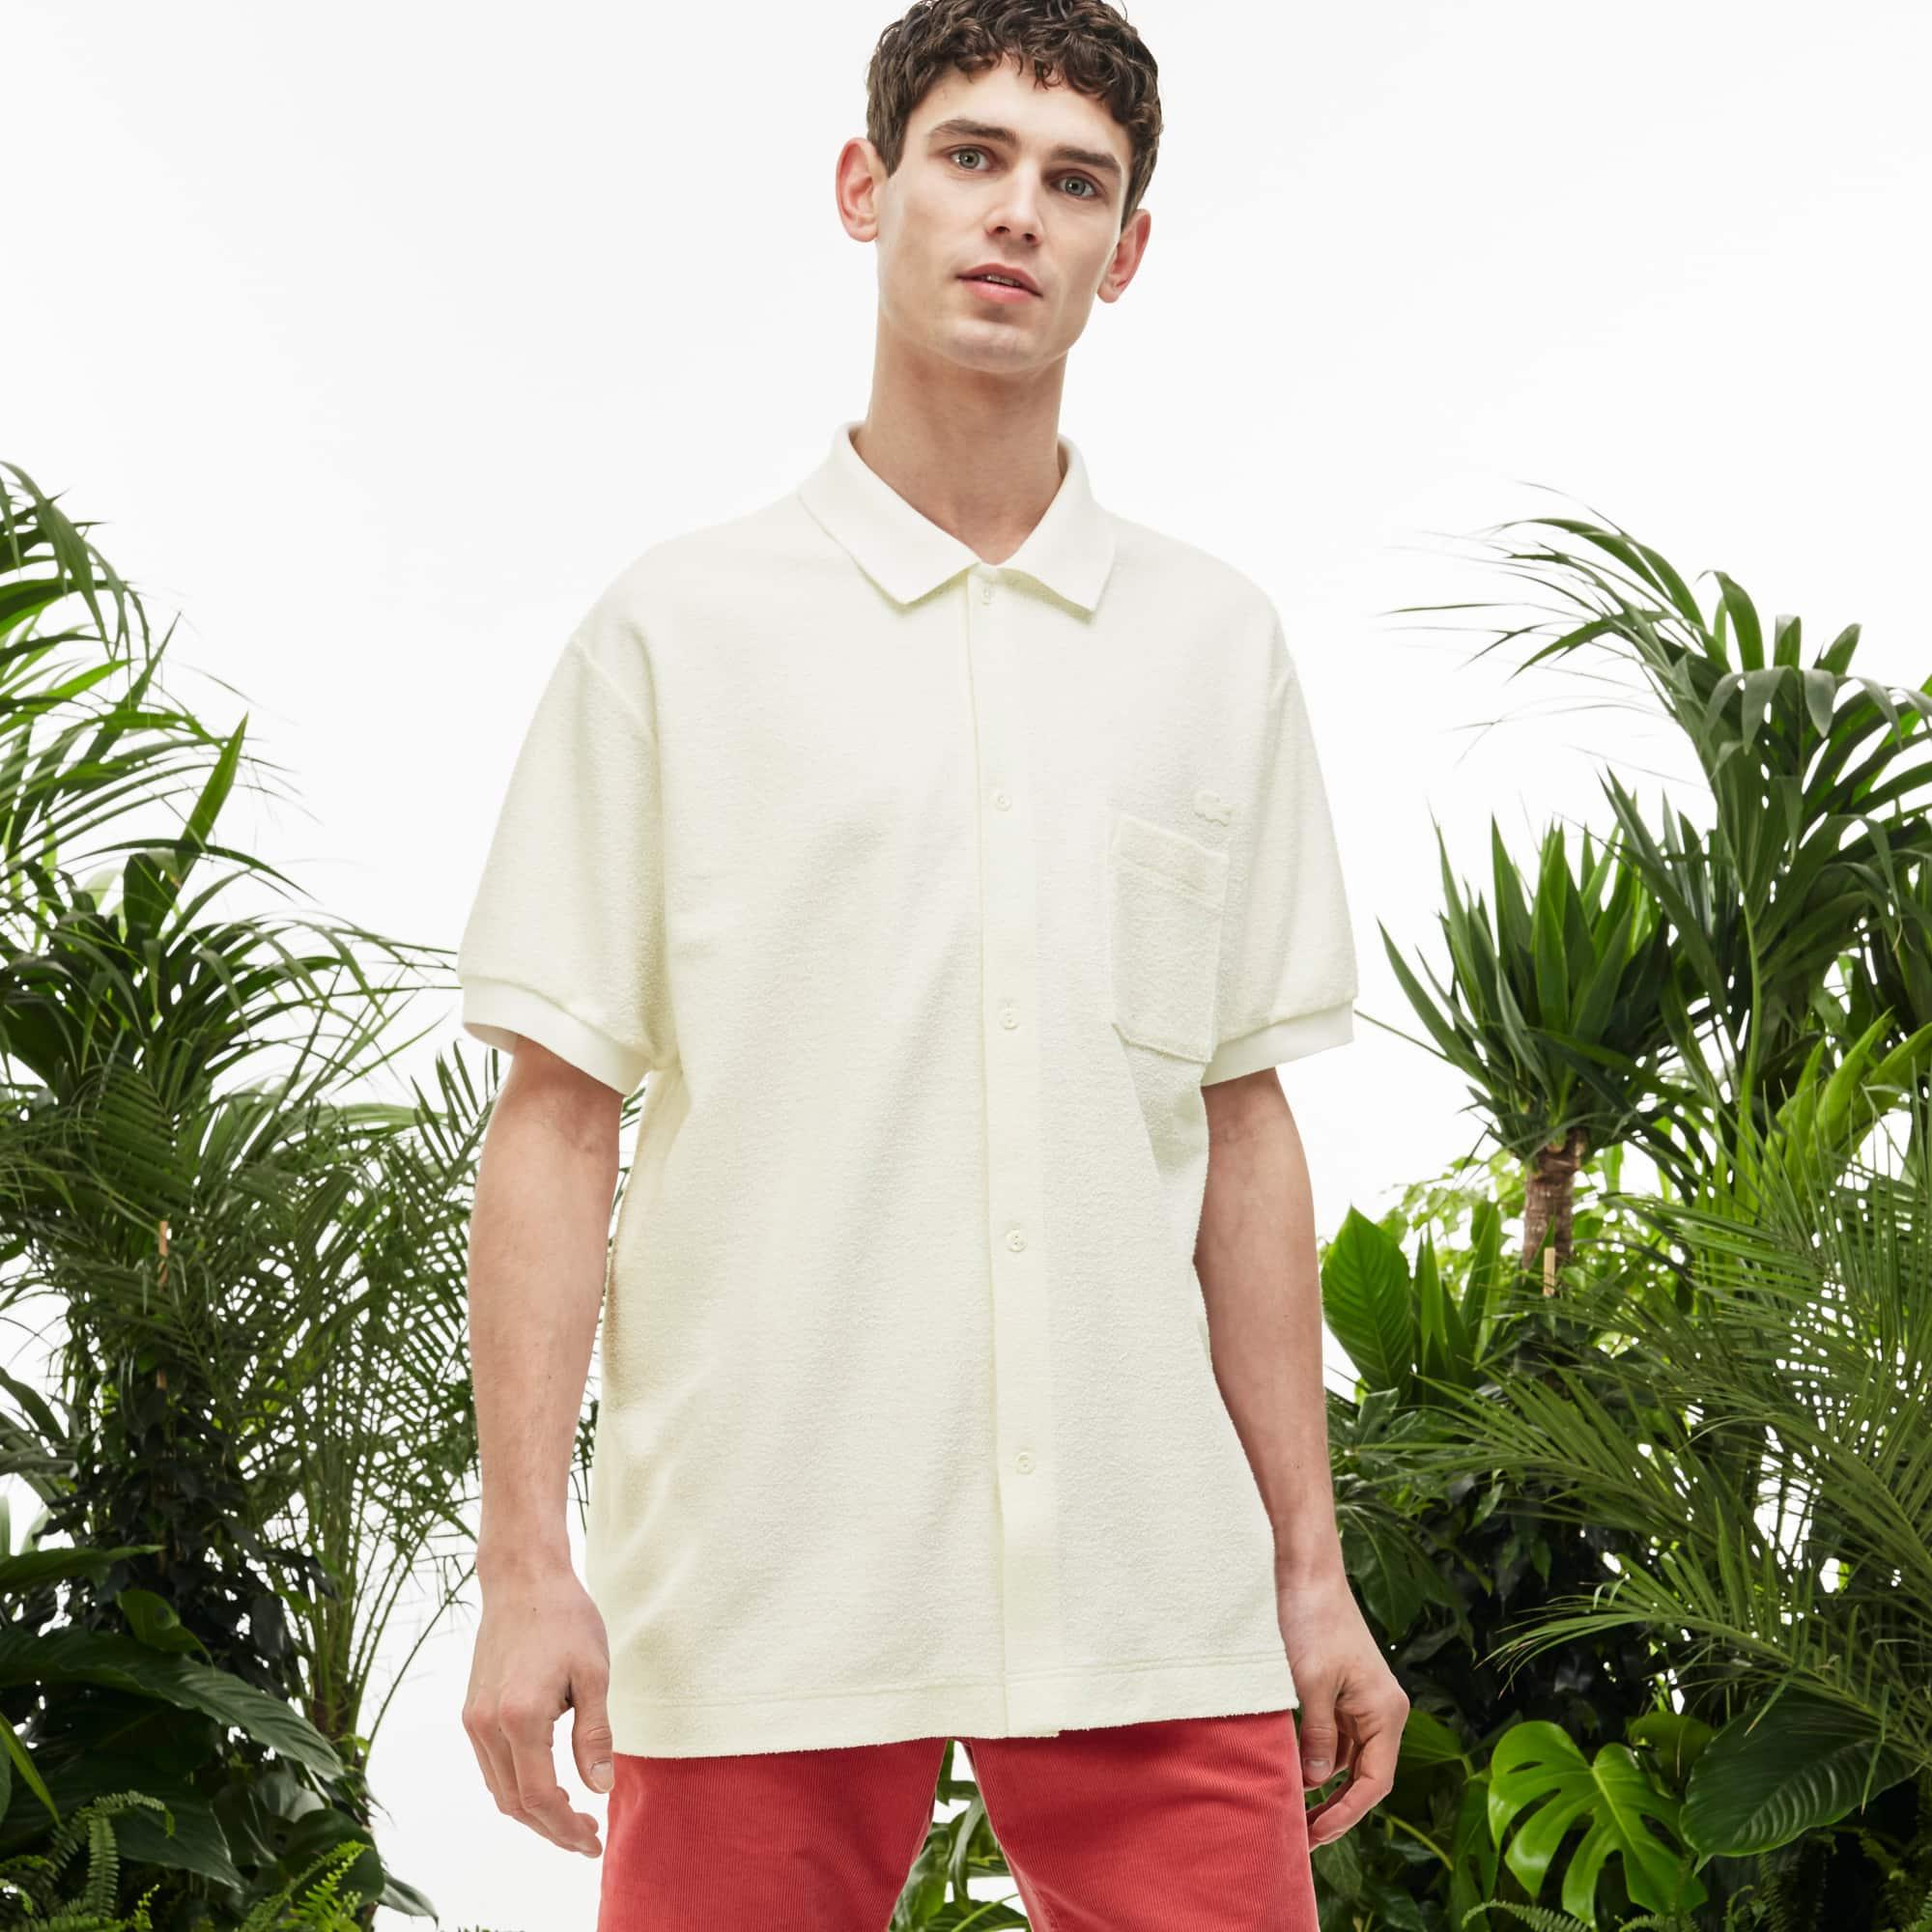 Men's Fashion Show Terrycloth Buttoned Polo Shirt